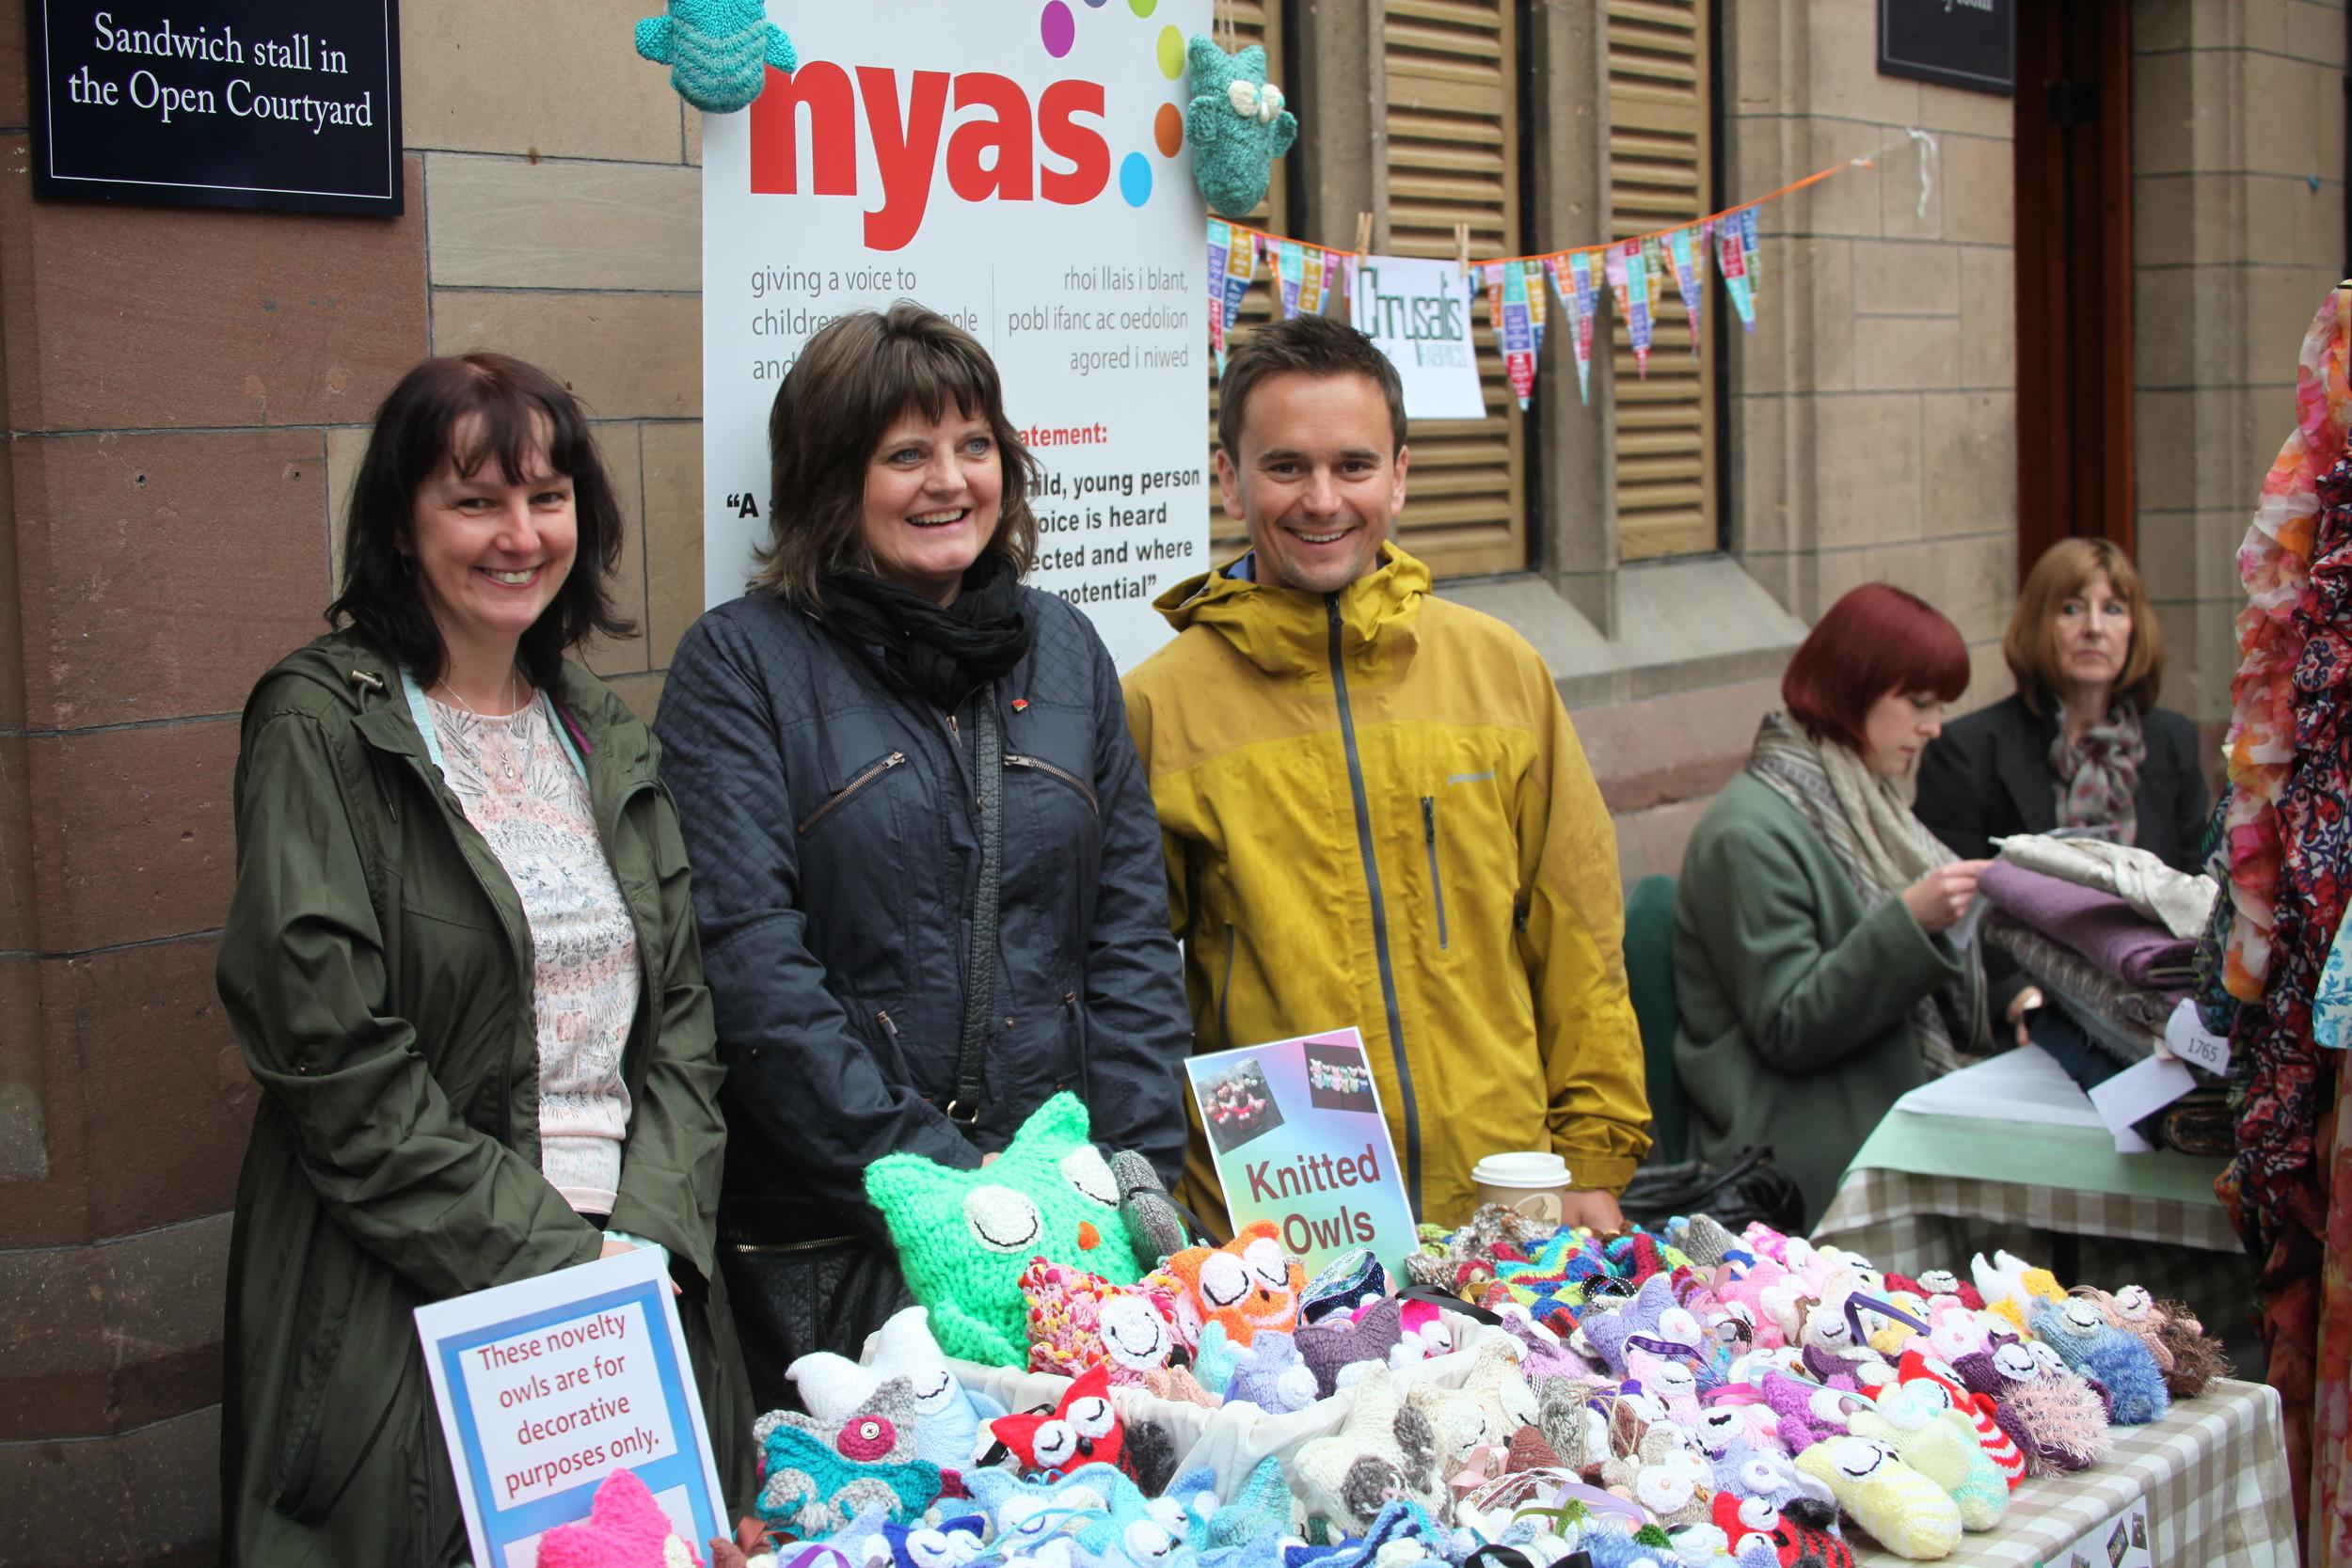 Pro bono event organising support of NYAS fundraising at Eaton Hall